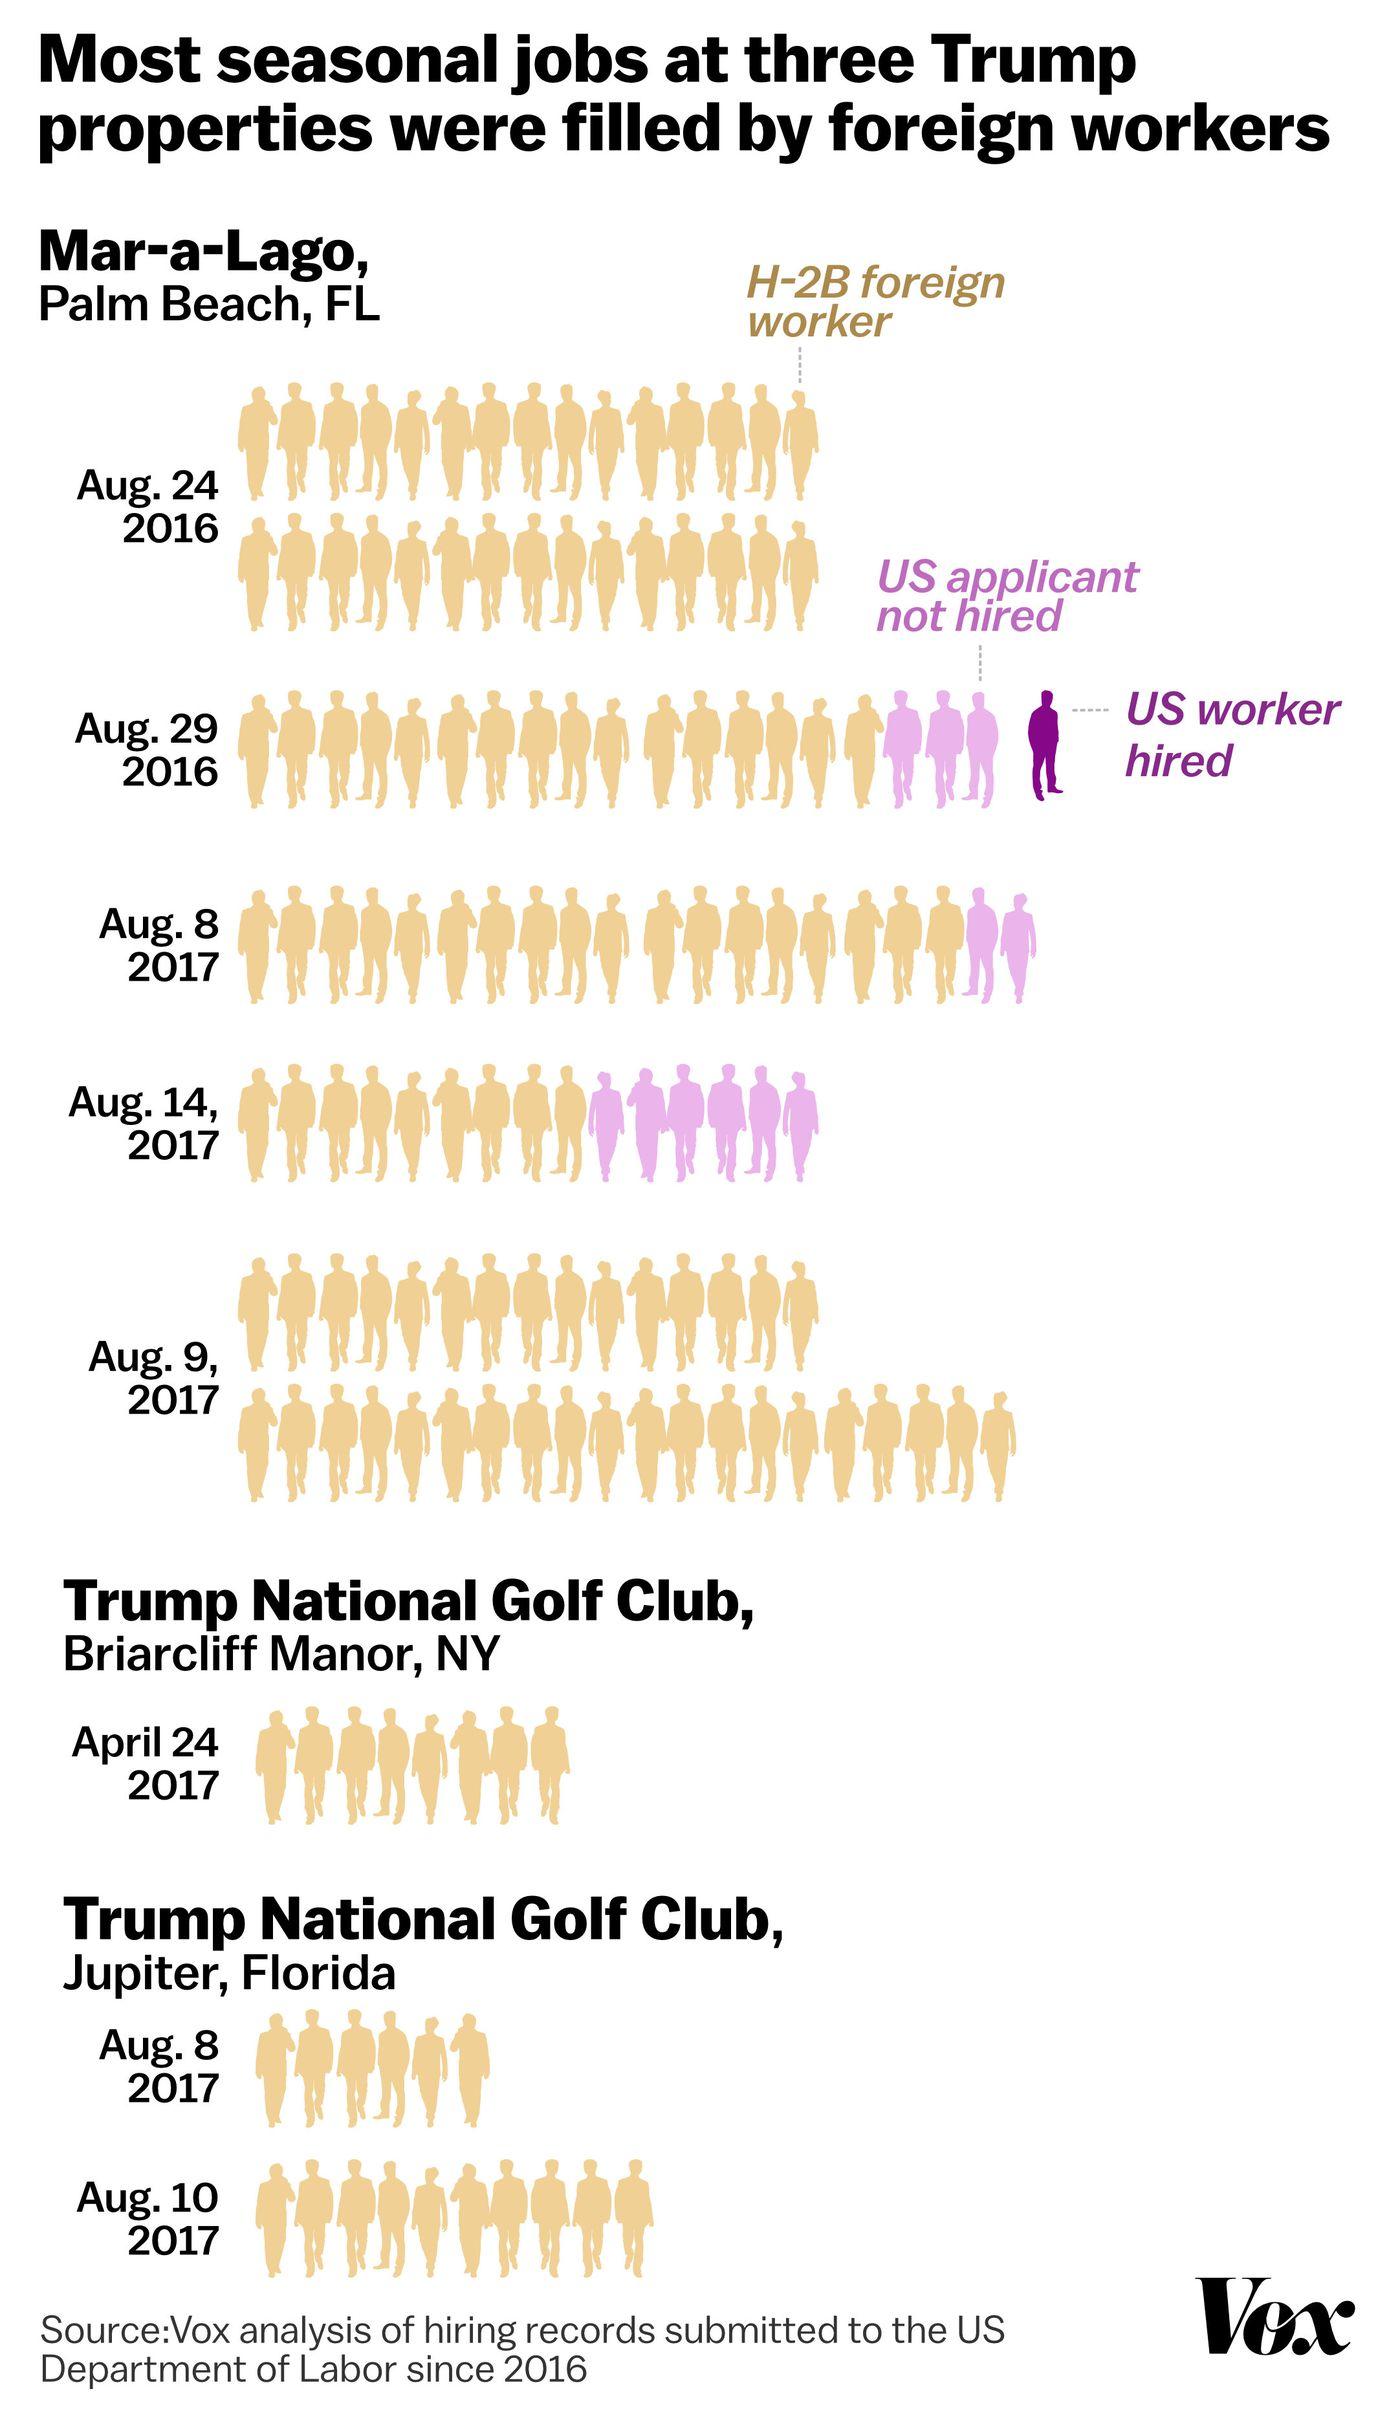 Trump Organization properties posted 144 H2-B visa job openings